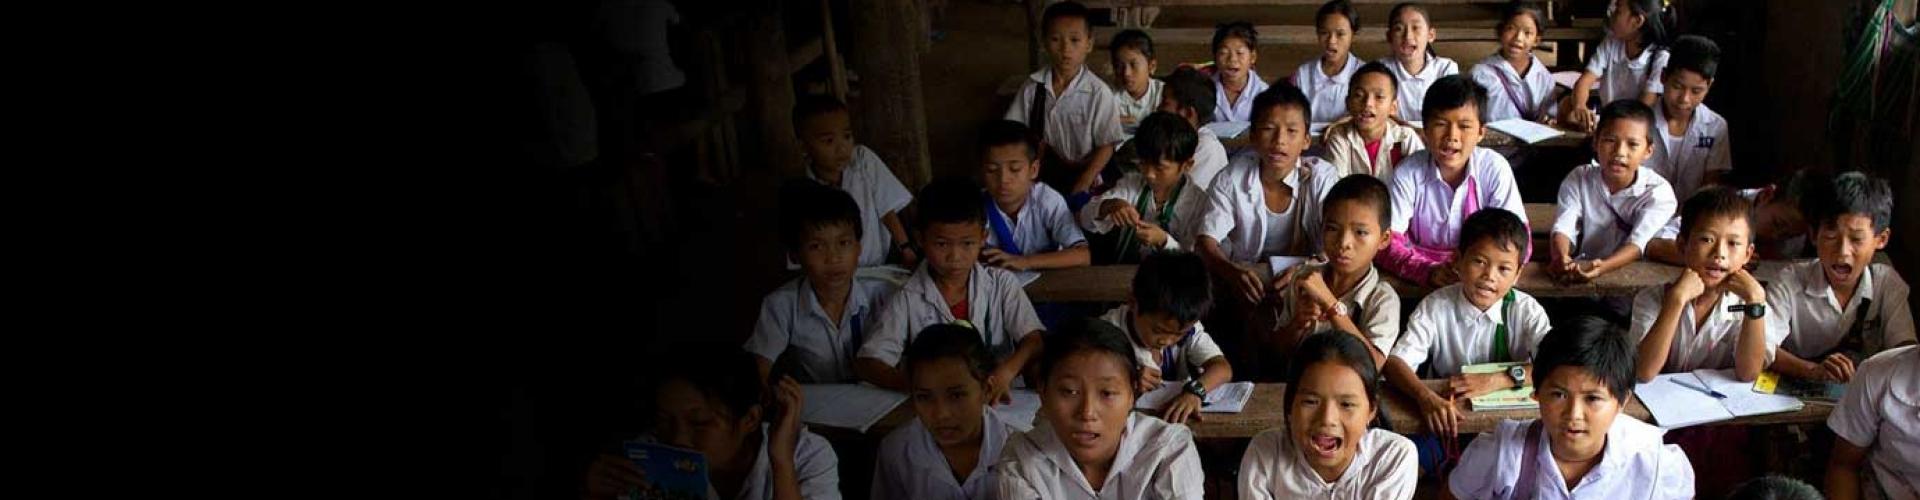 UNHCR ยินดีในความมุ่งมั่นของไทยในการลดภาวะไร้รัฐไร้สัญชาติที่เกิดขึ้นกับเด็ก